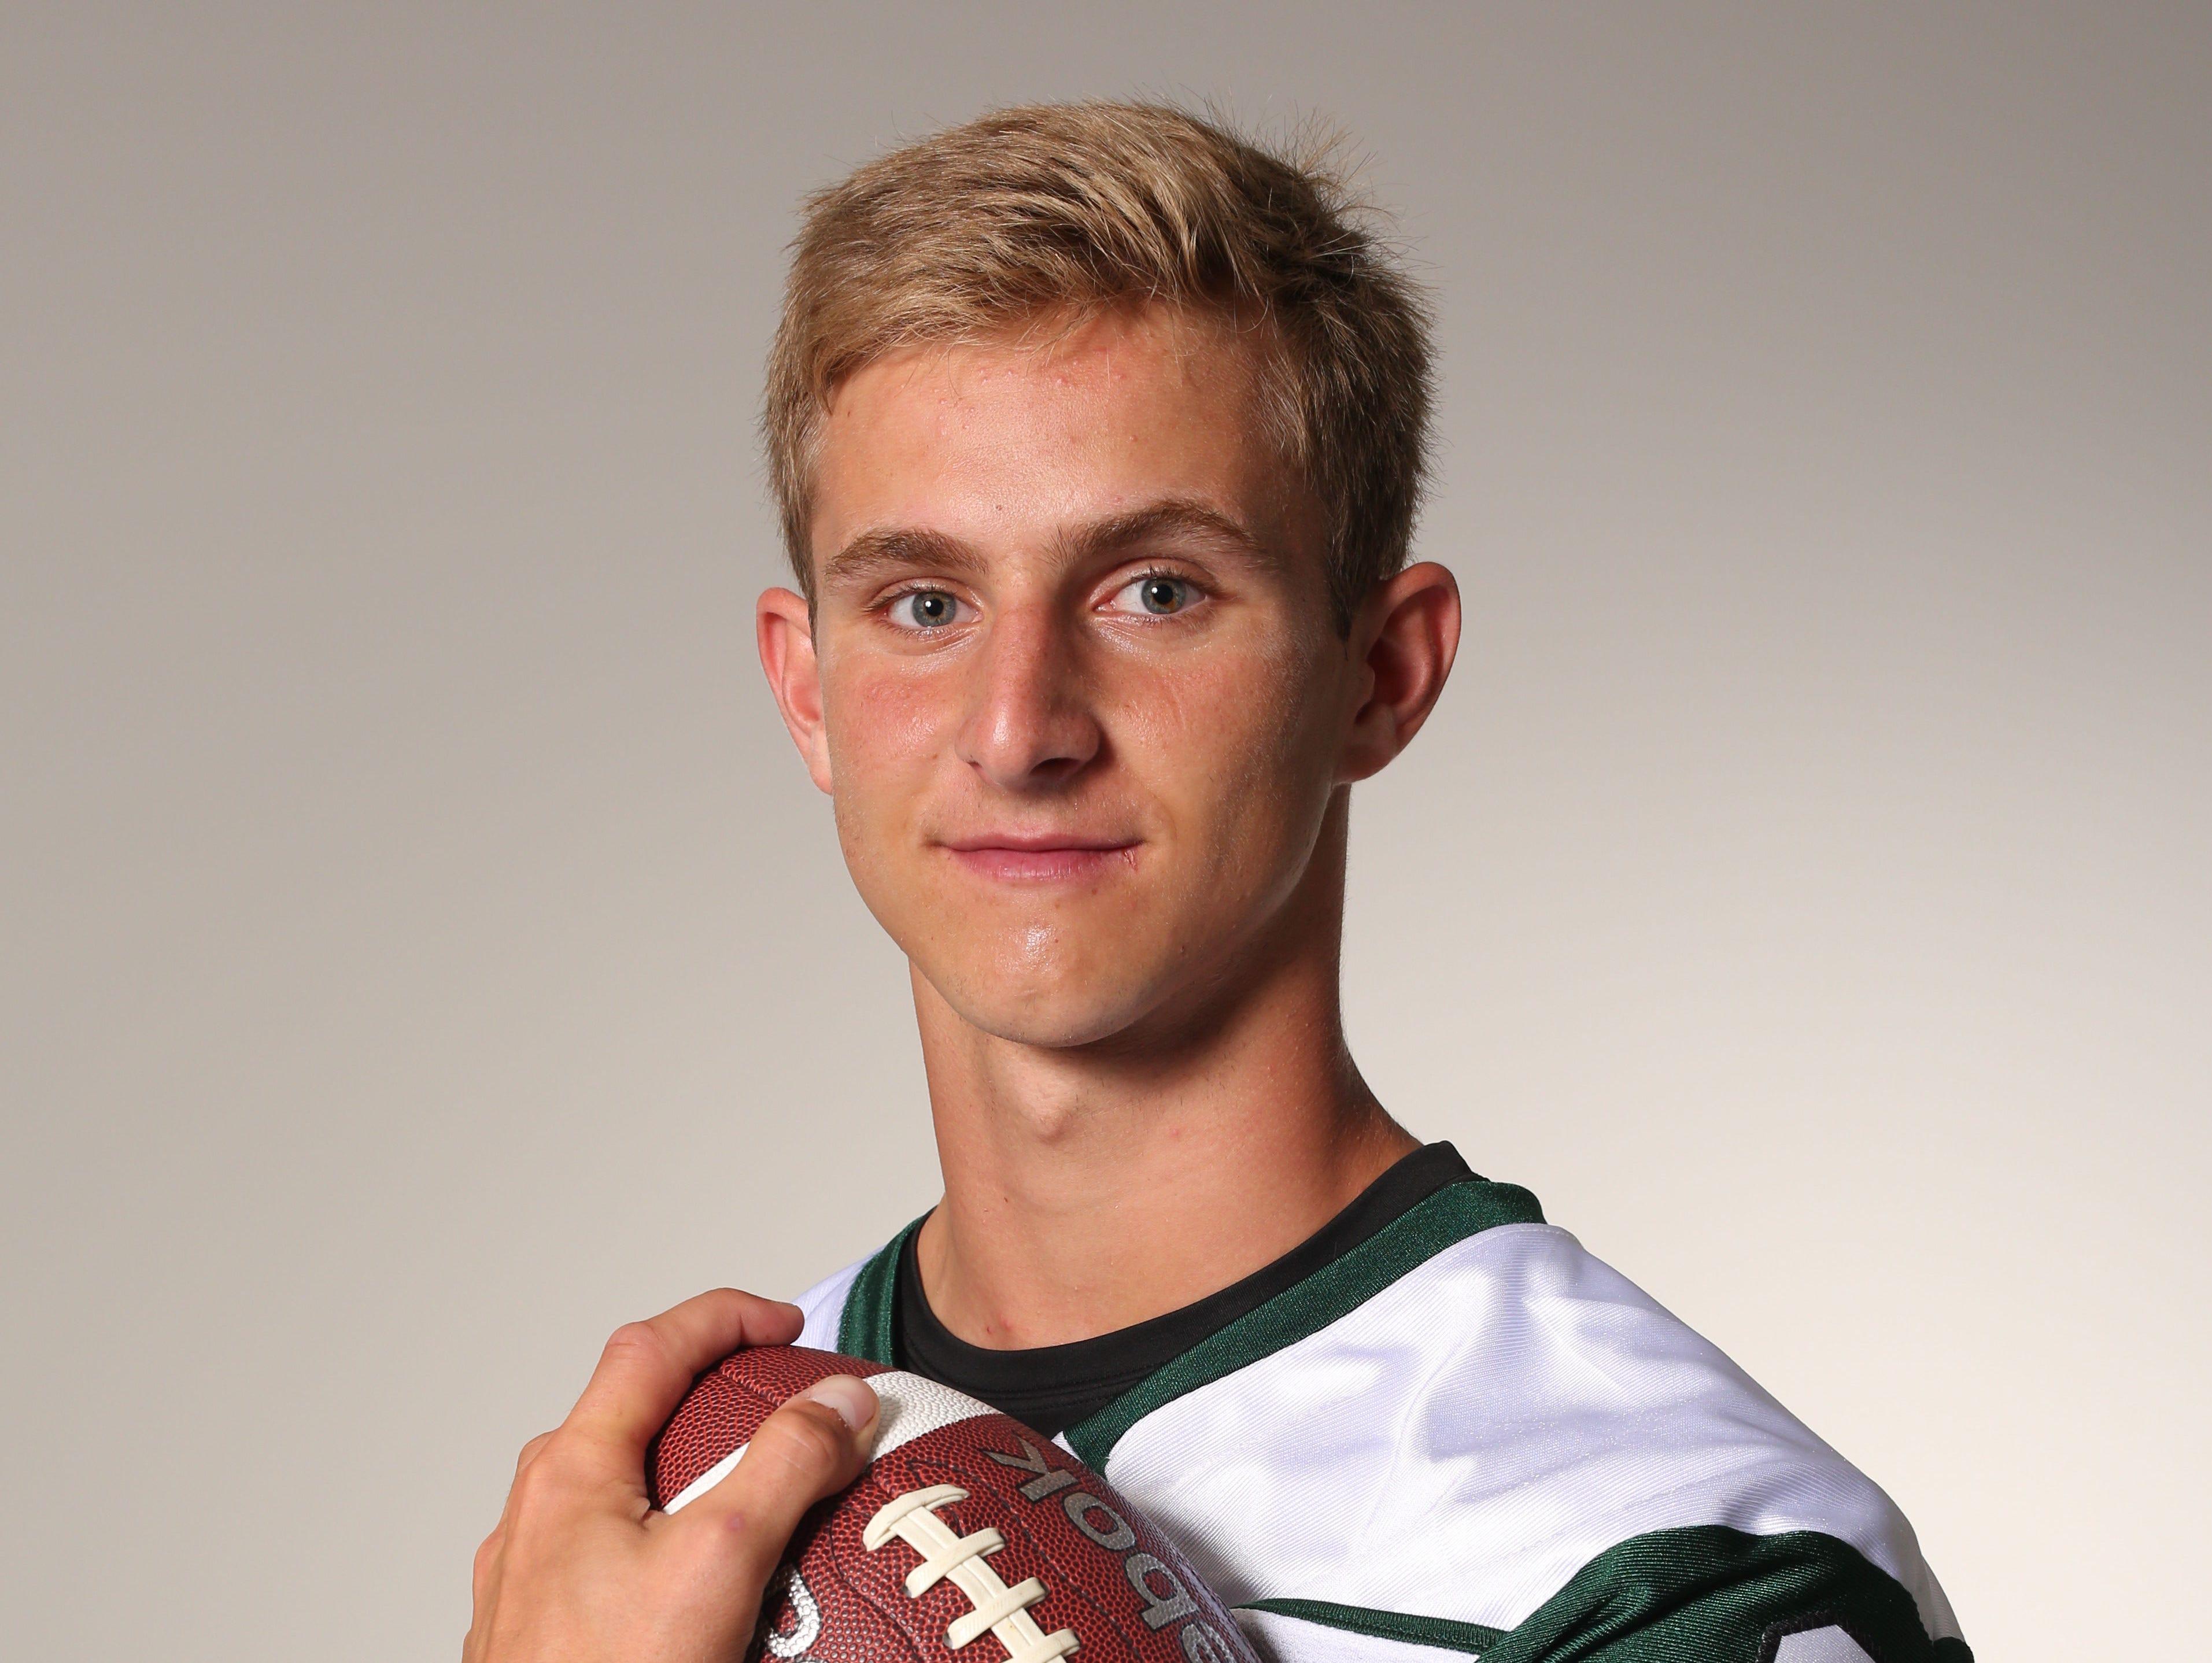 Jack Guida, quarterback at Brewster High School, photographed Aug. 24, 2016.